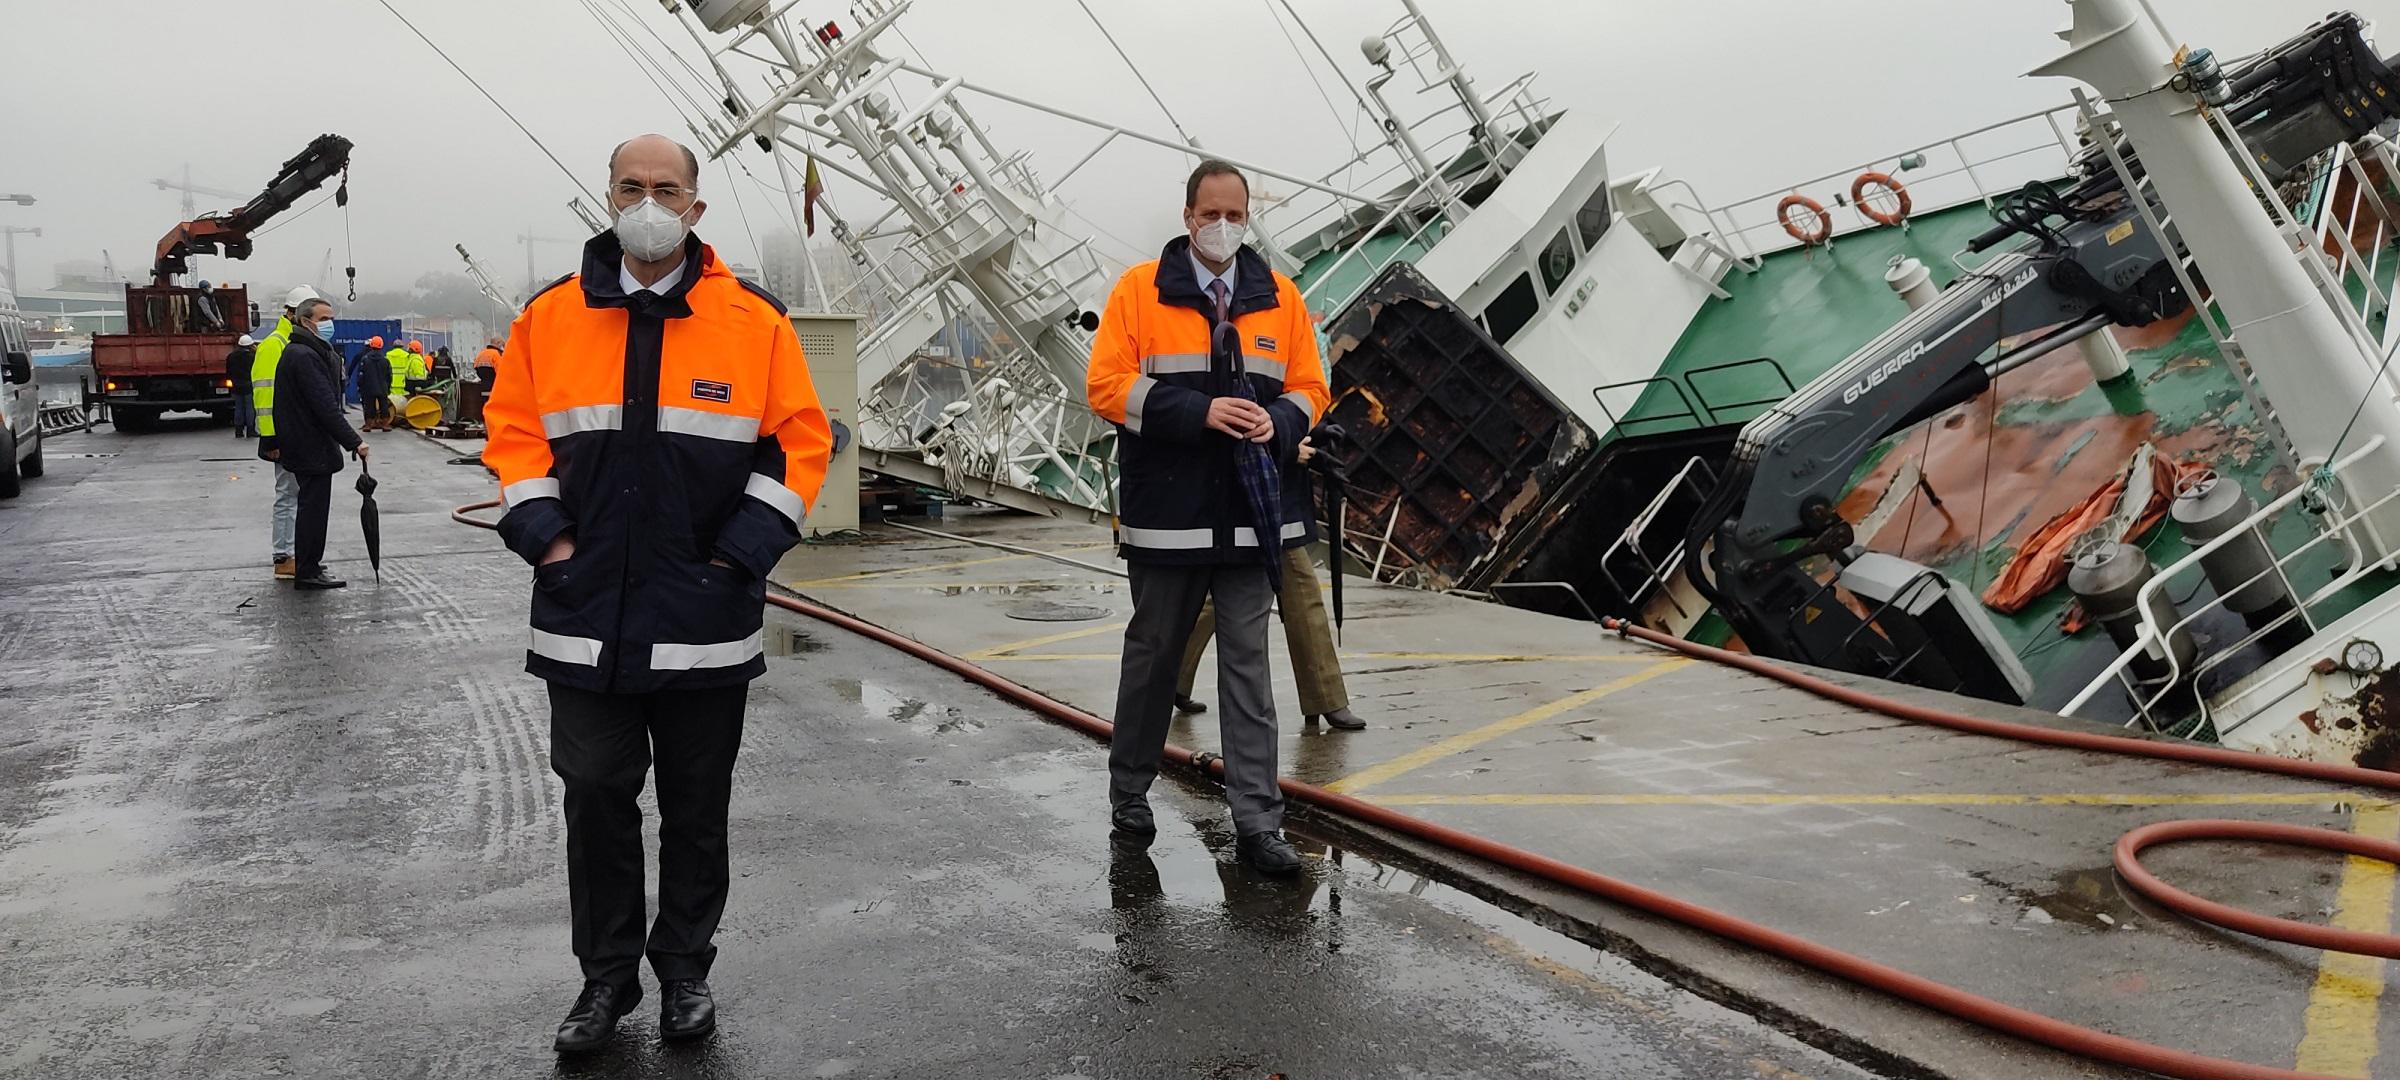 Reflotamiento arrastrero Baffin Bay Vigo